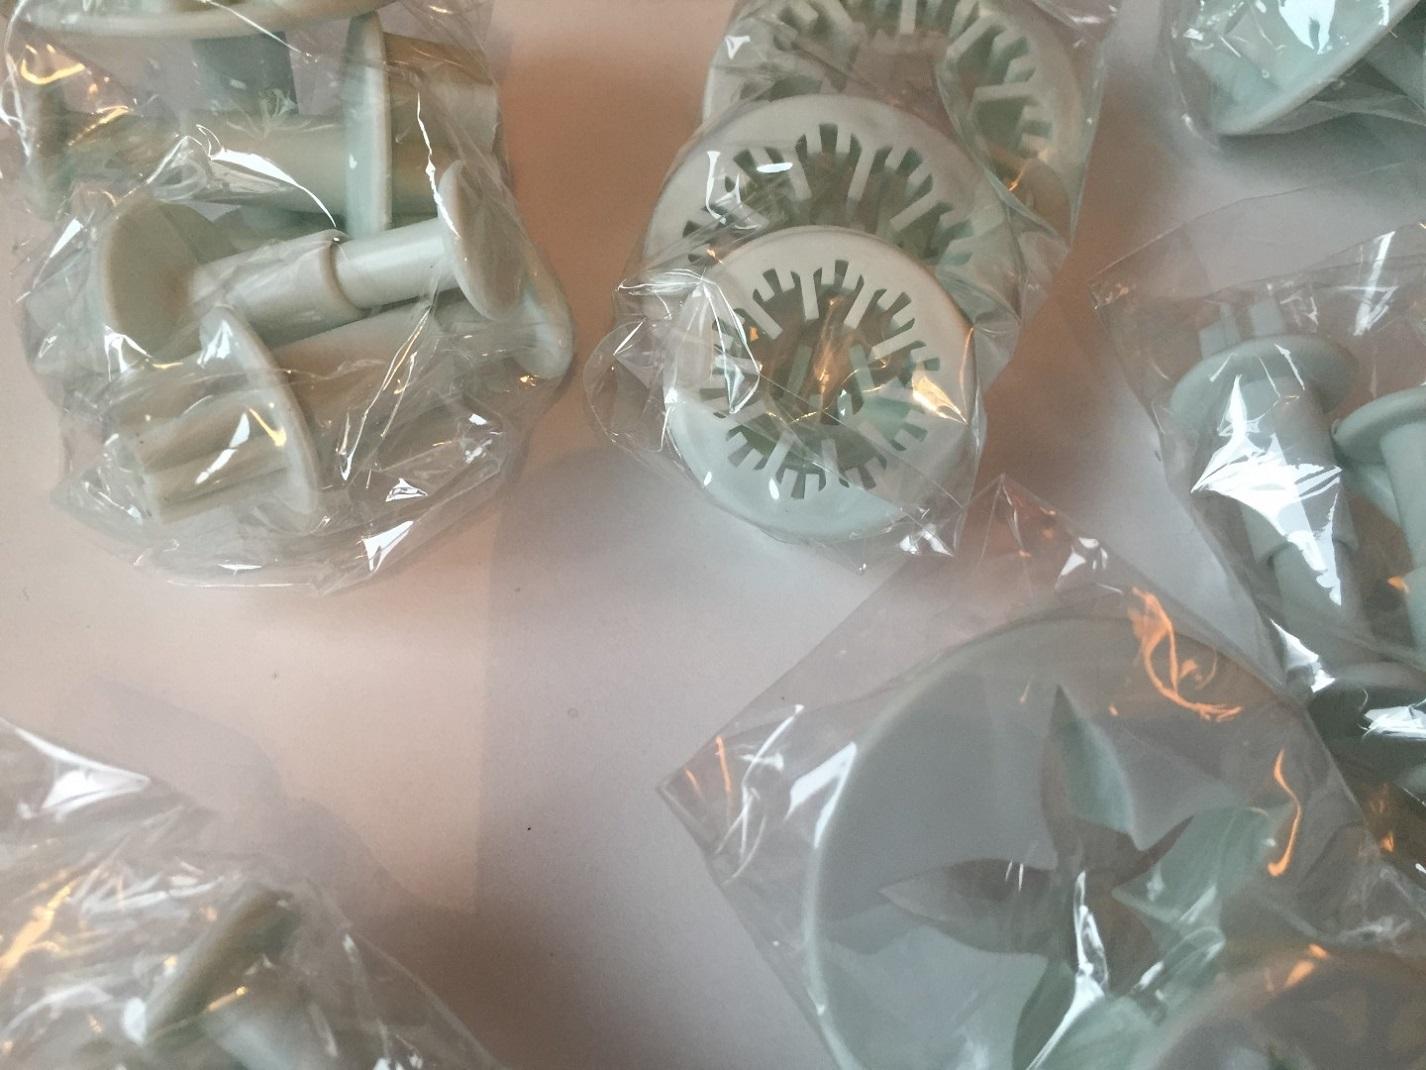 Fondant Cutters In Packaging